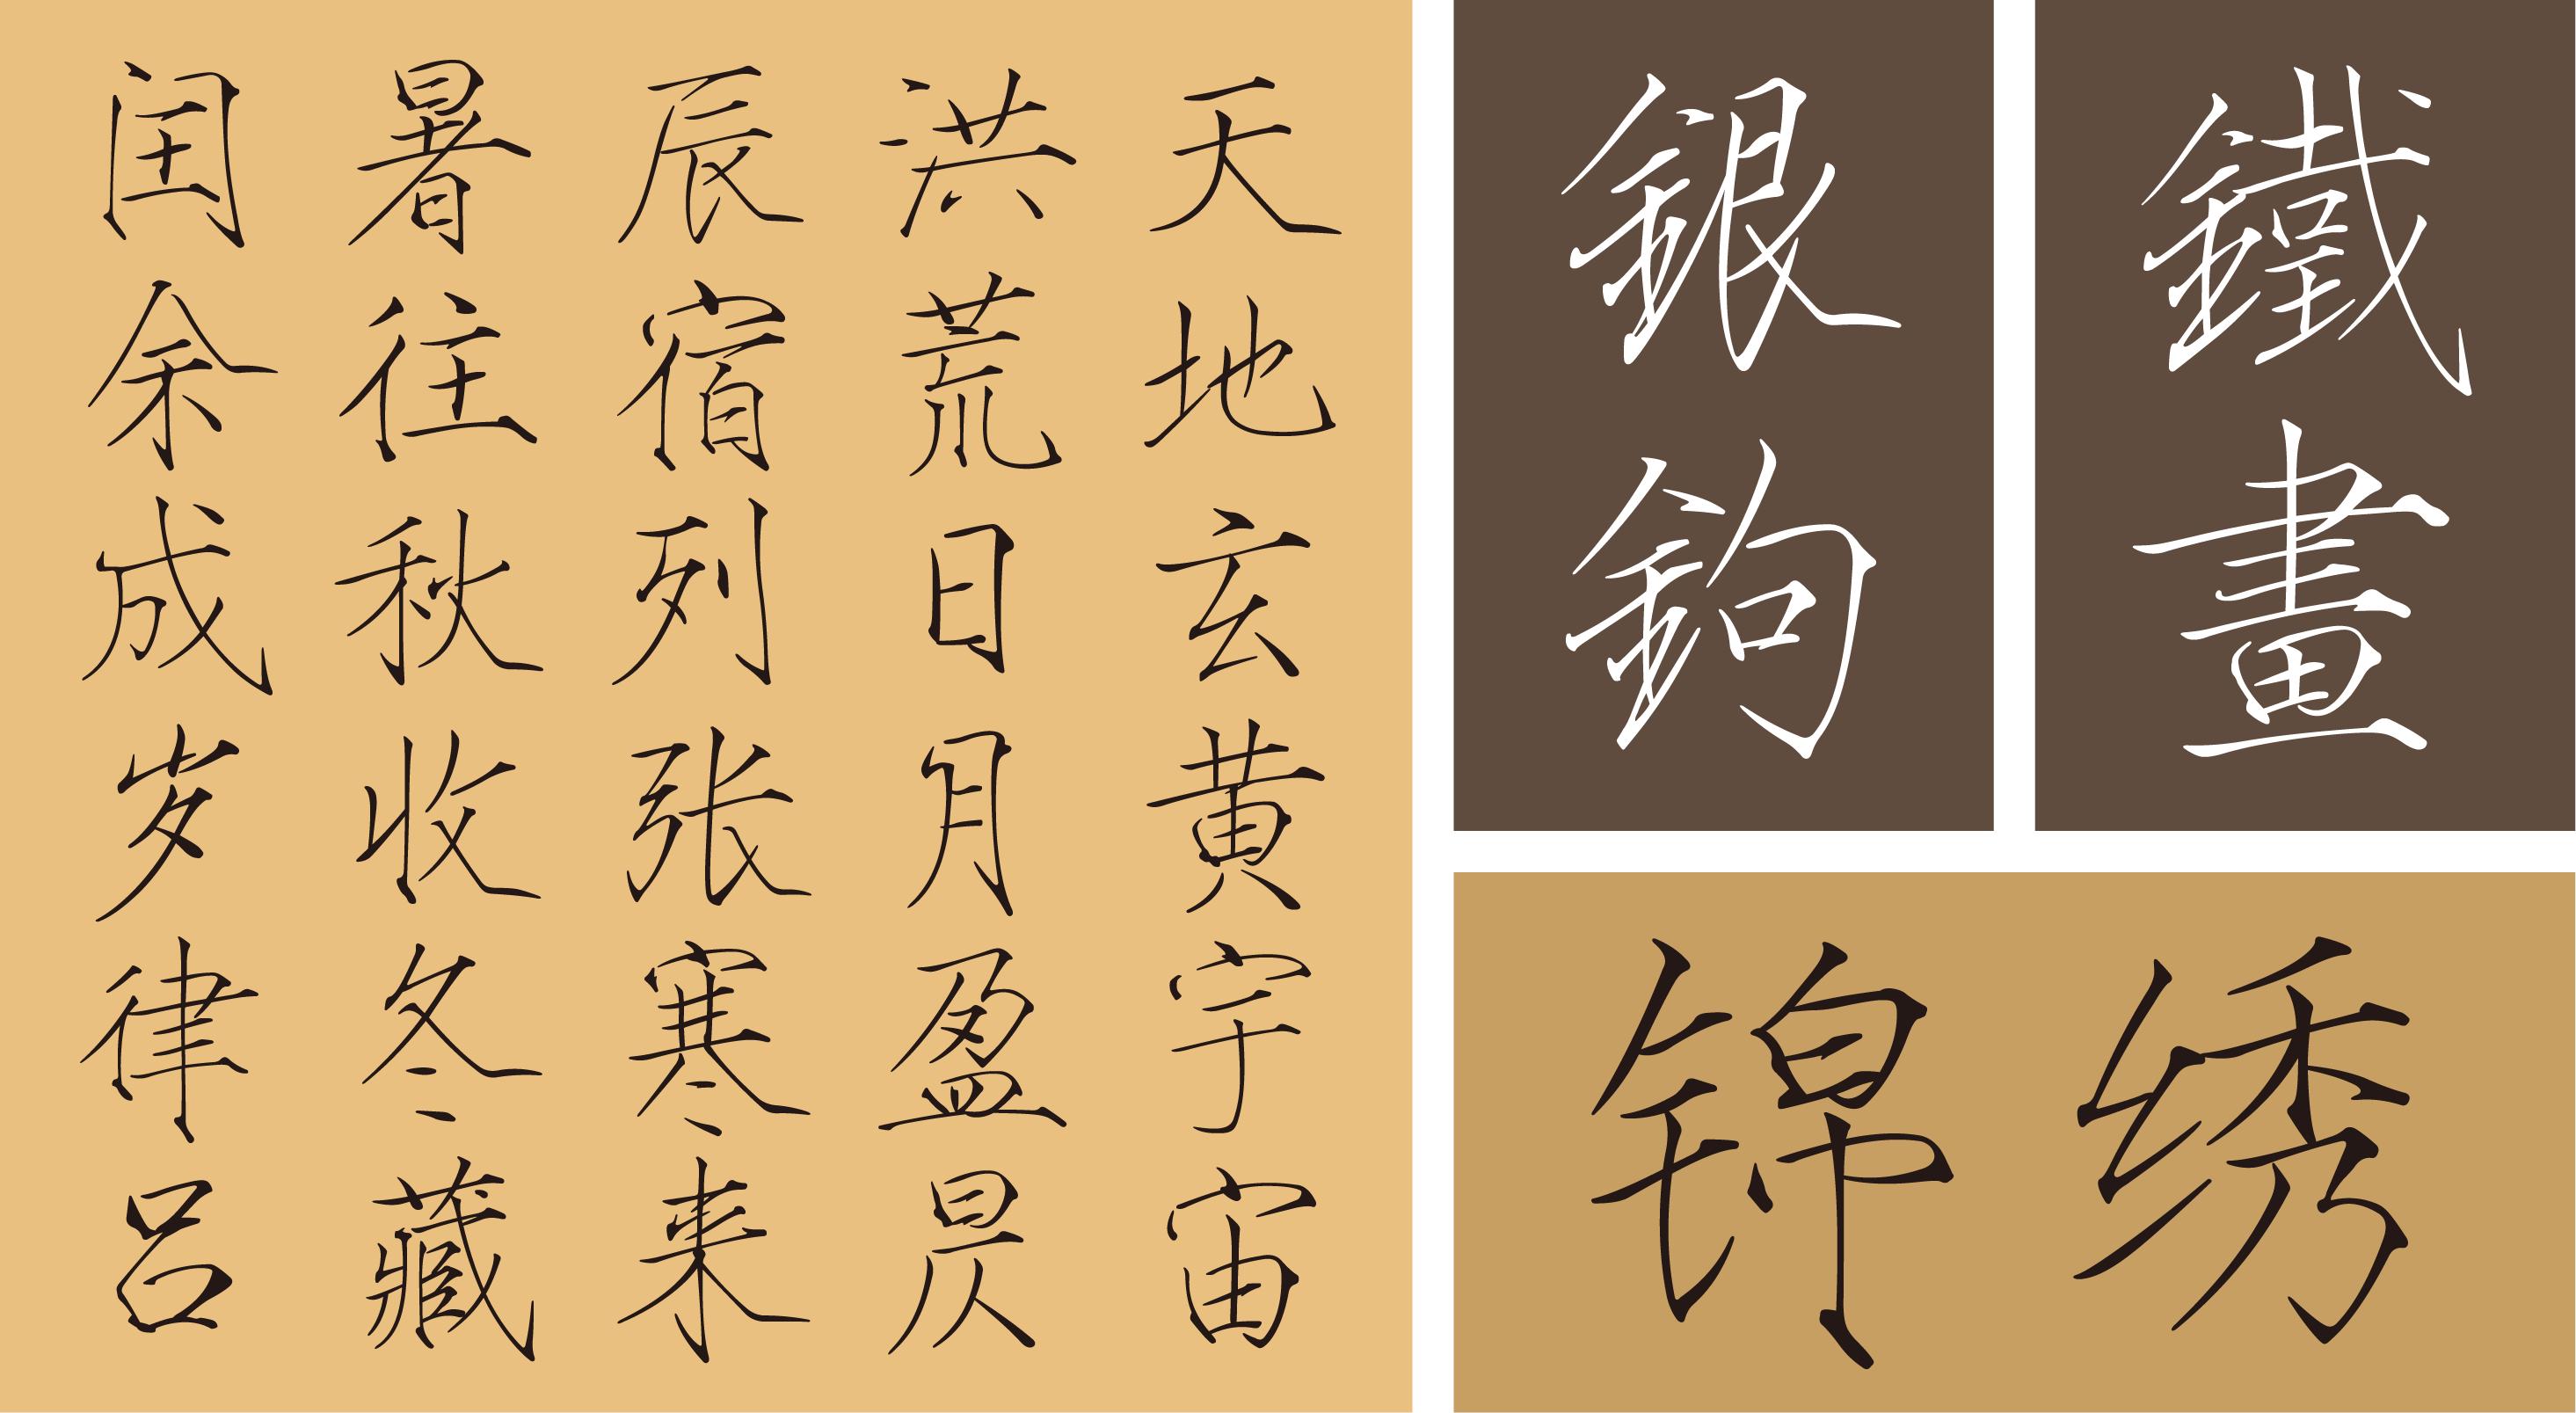 https://ft-bk1.oss-cn-zhangjiakou.aliyuncs.com/Public/Uploads/img/n_content_20201210174810_5779.png